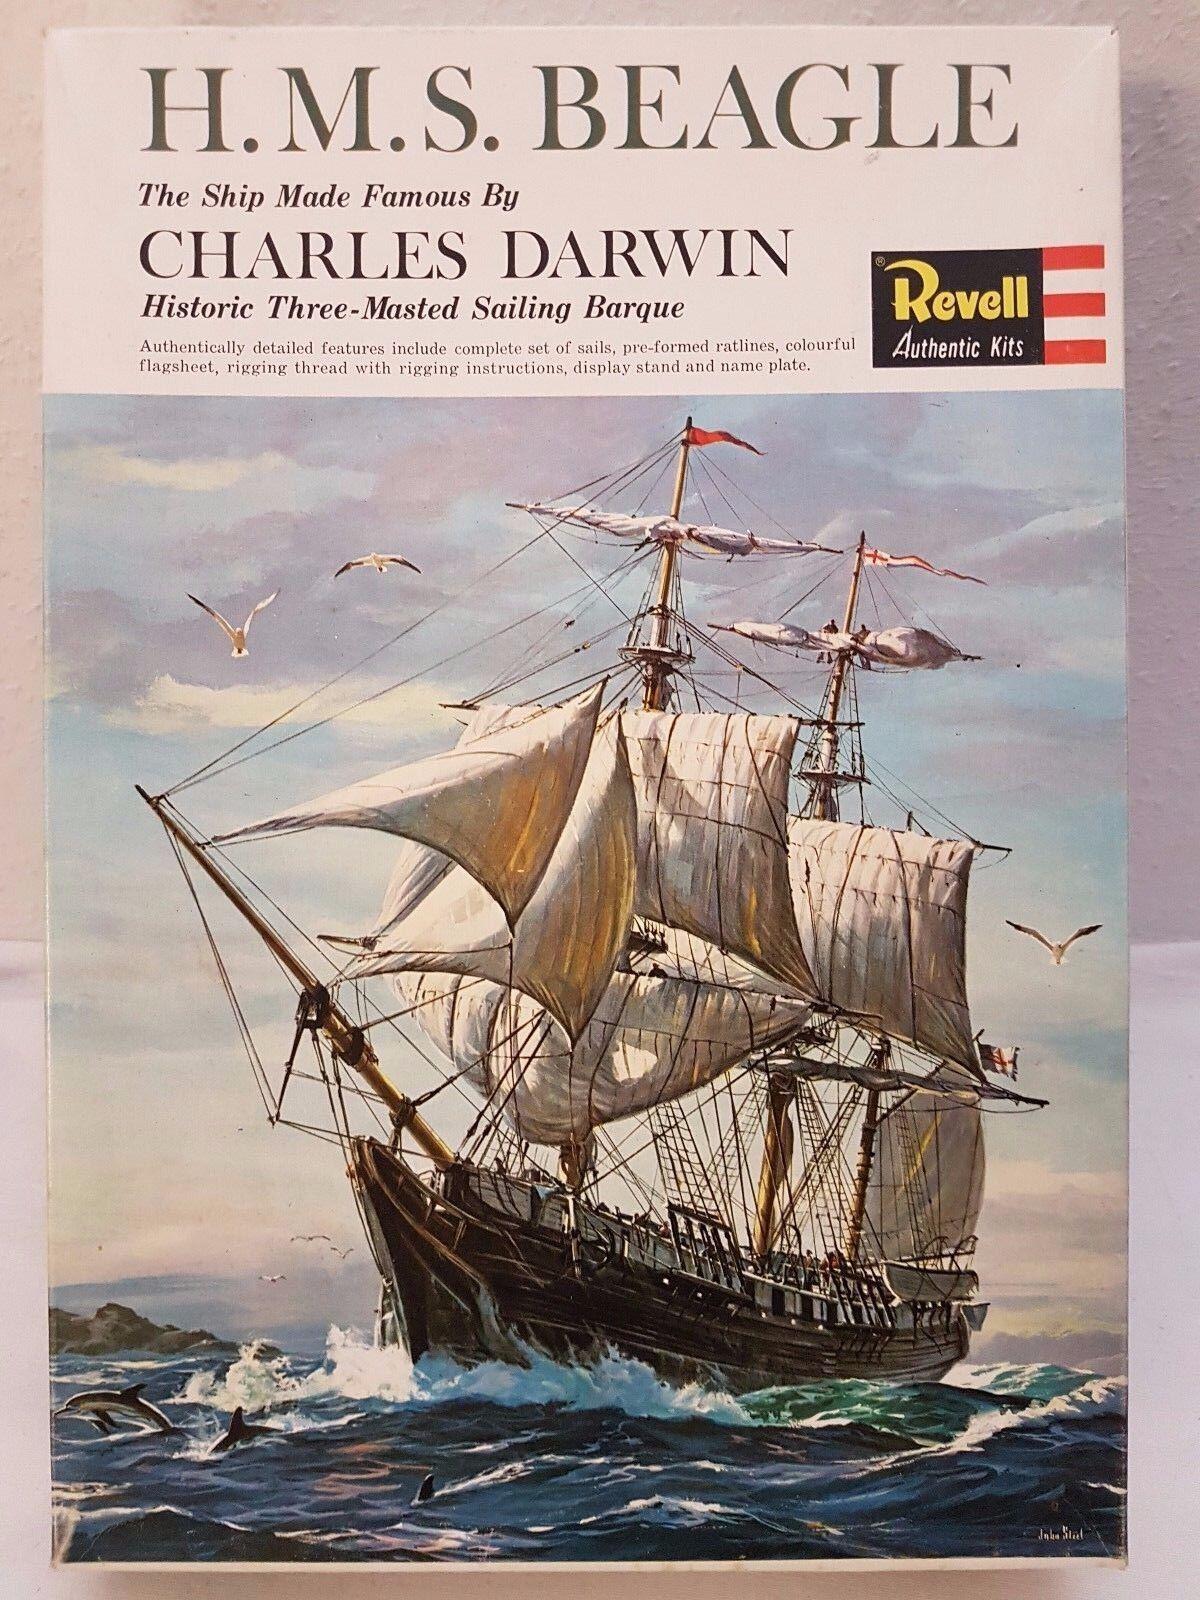 Revell H-328 H-328 H-328 H.M.S. Beagle The Ship Made Famous By C. Darwin Neu und eingetütet 04c766